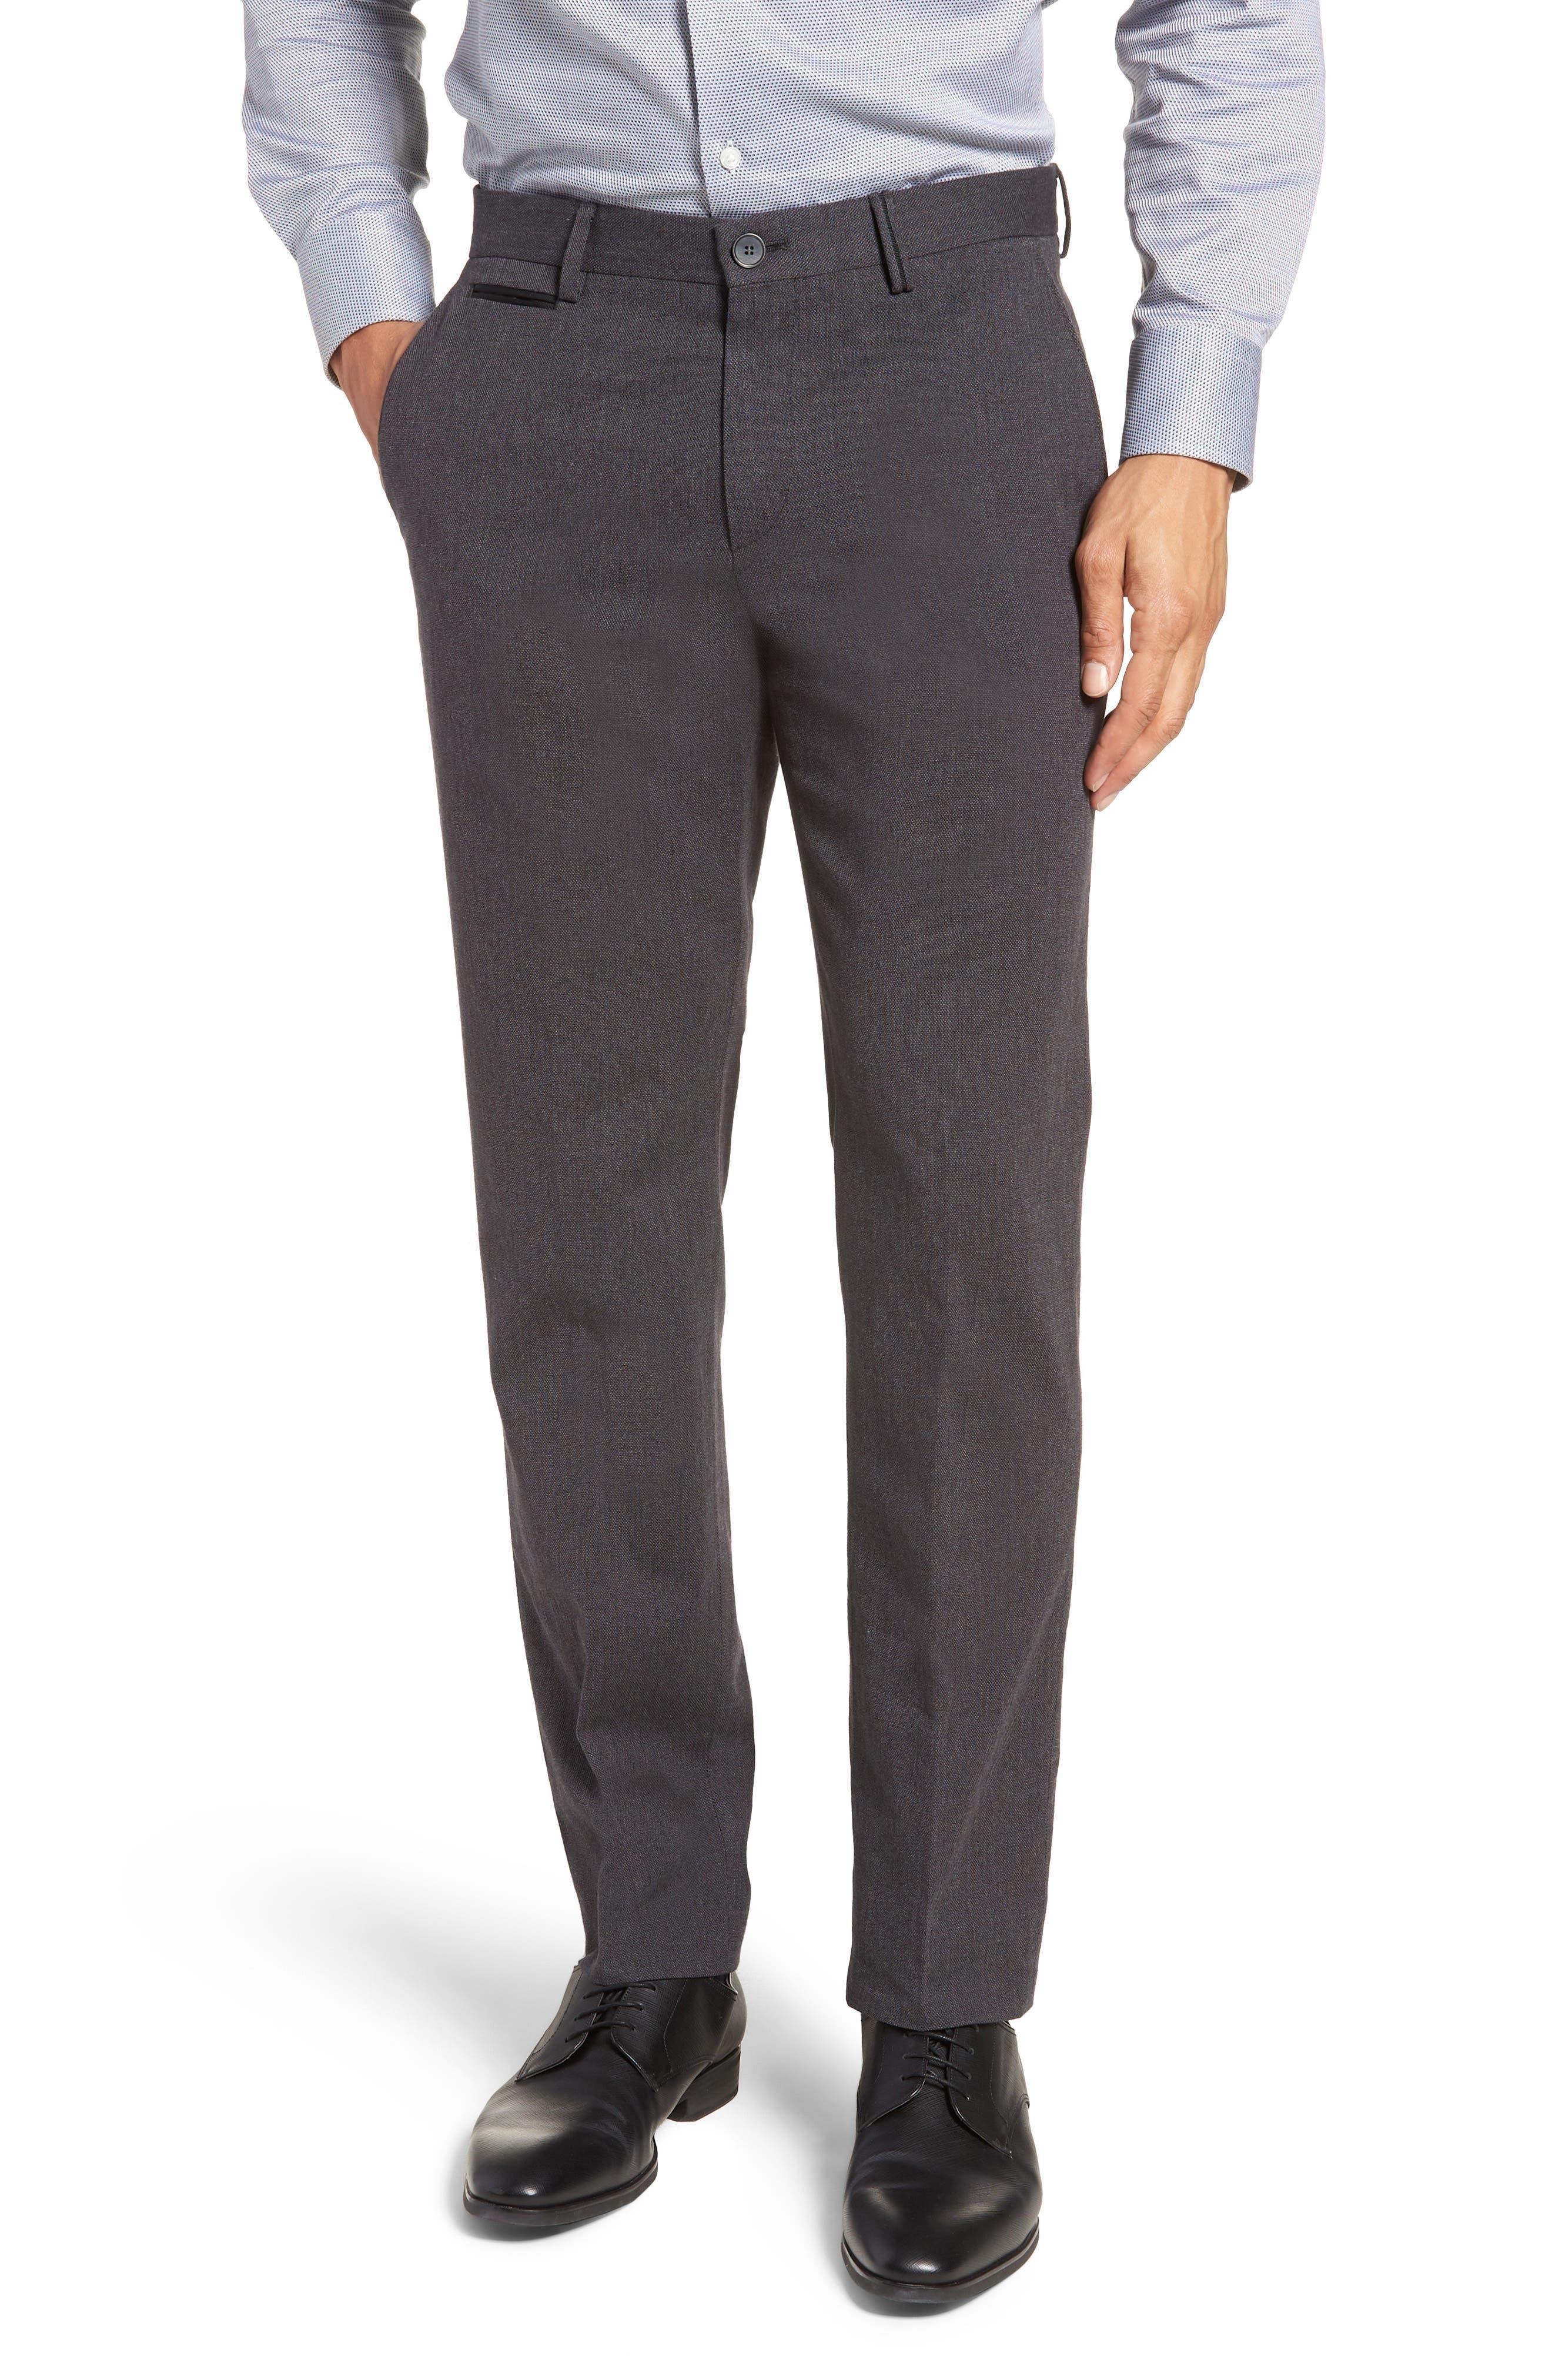 Batho Flat Front Solid Cotton Trousers,                             Main thumbnail 1, color,                             MEDIUM GREY